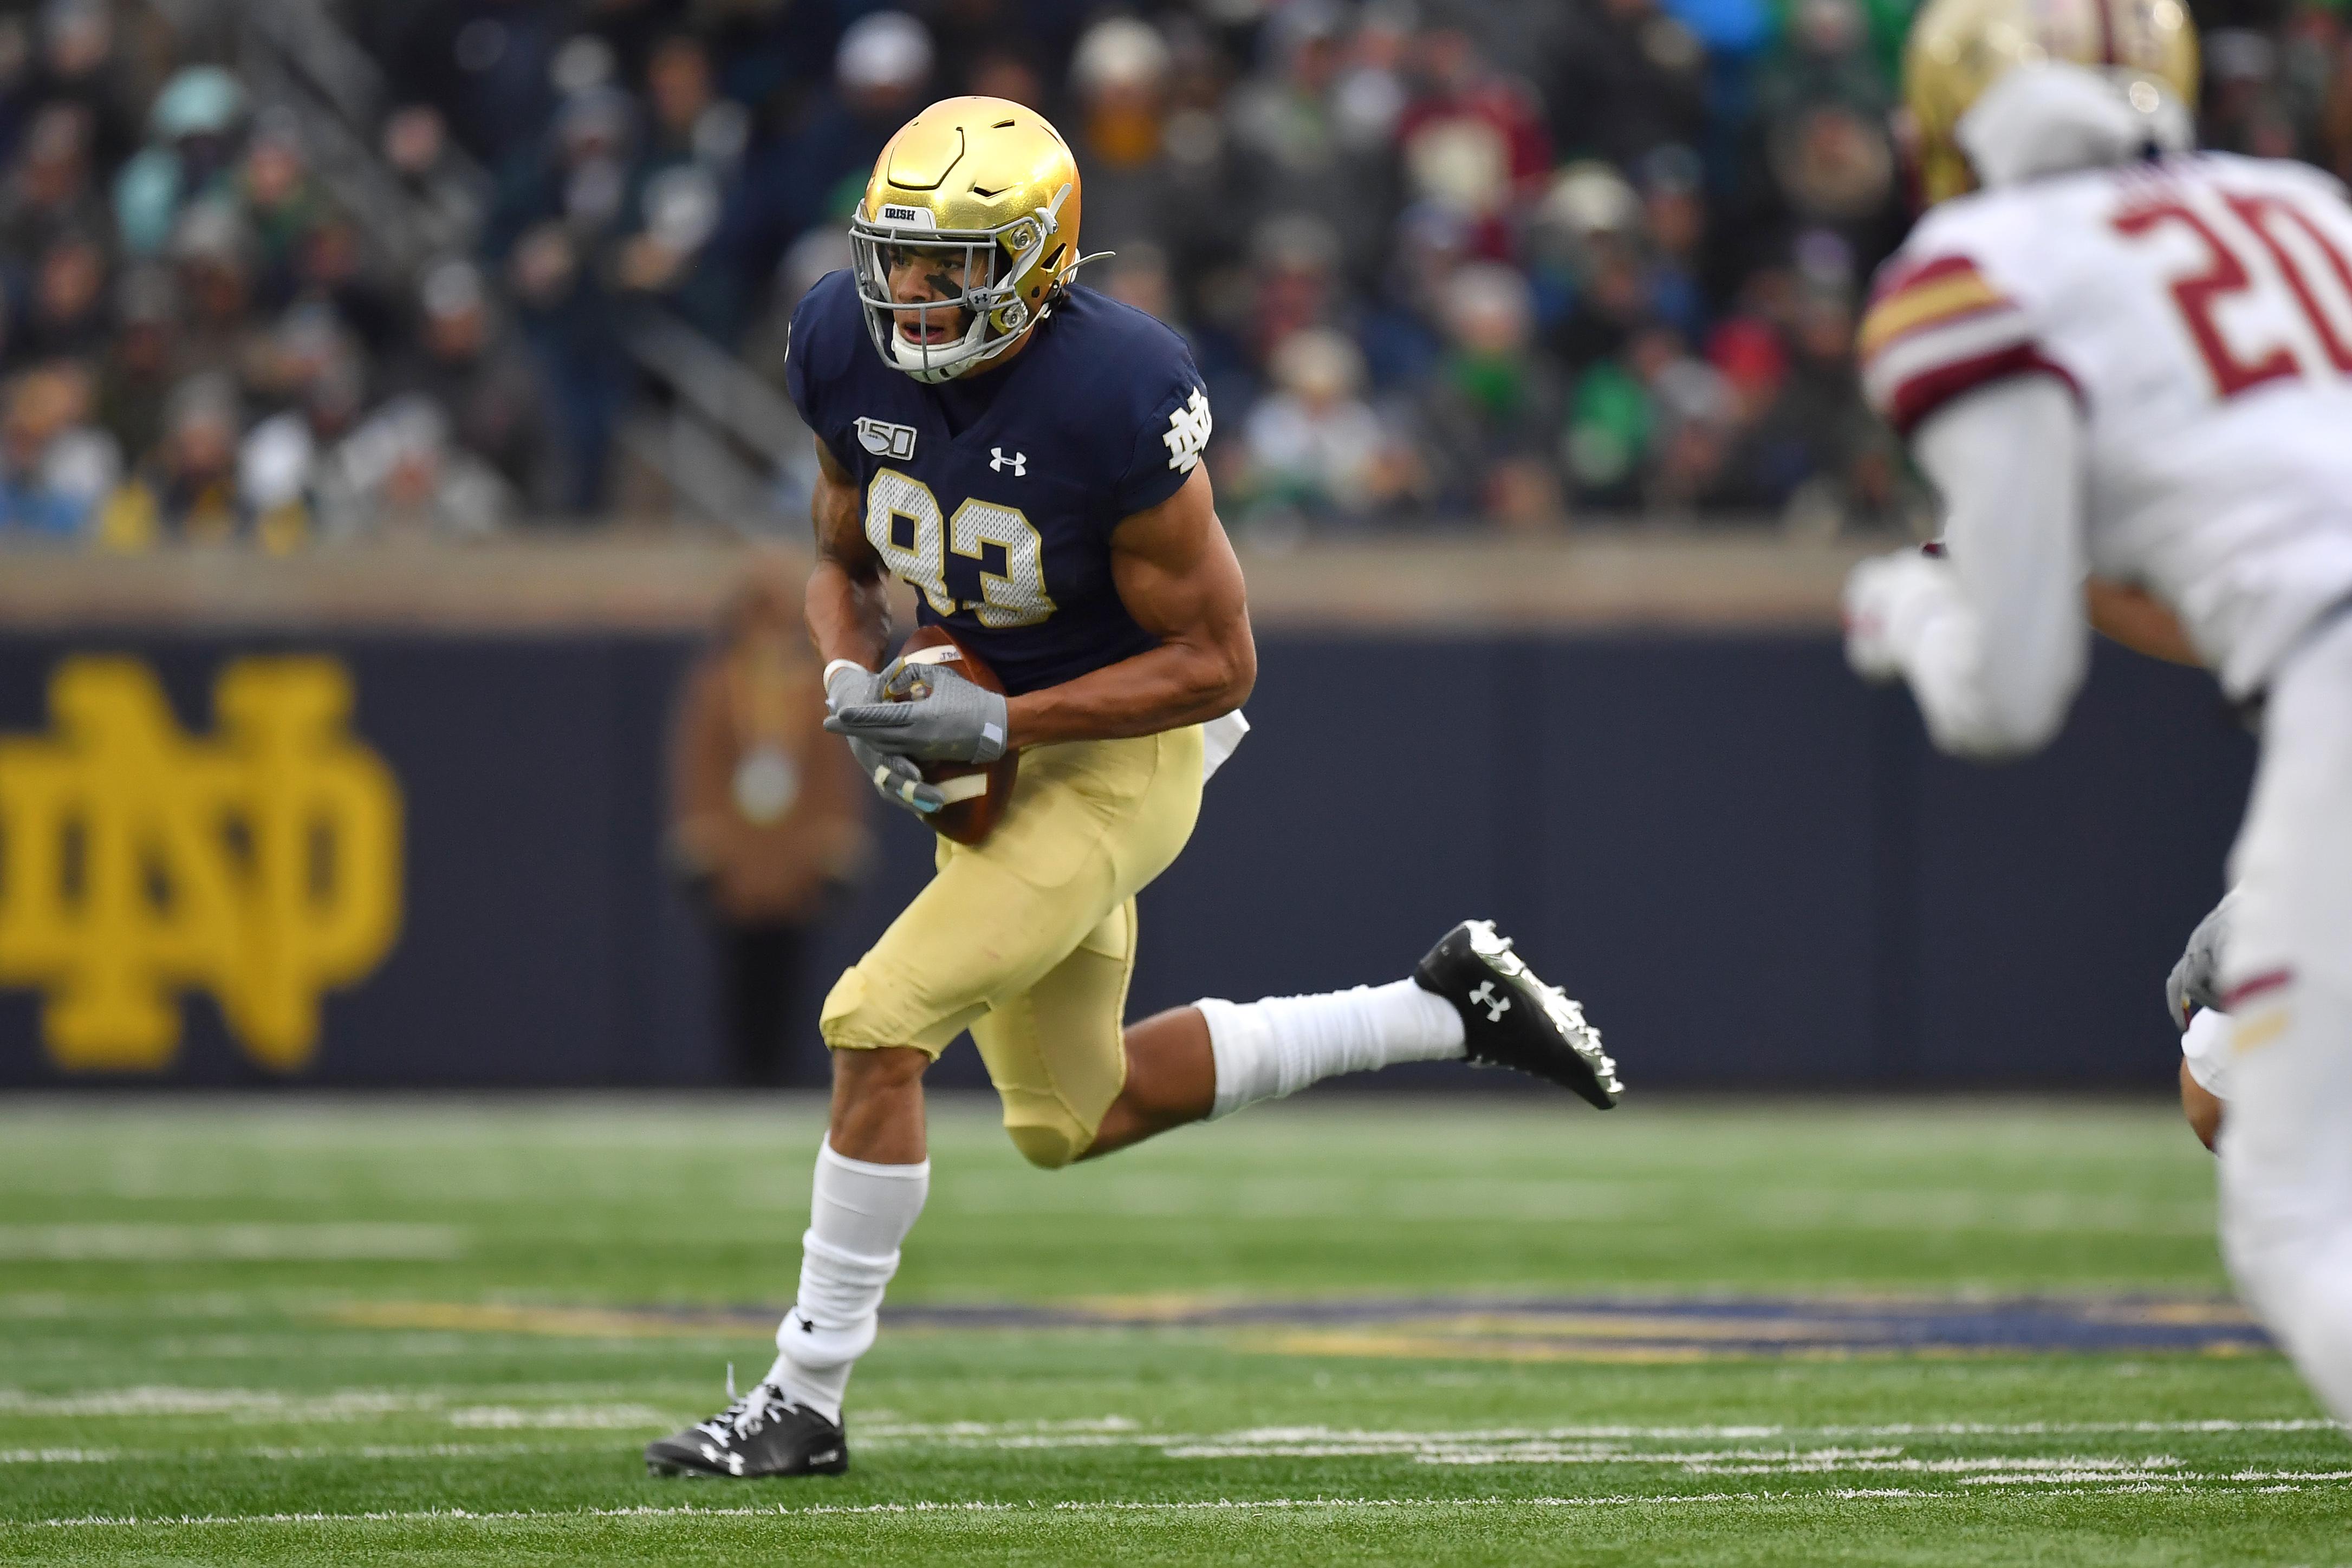 COLLEGE FOOTBALL: NOV 23 Boston College at Notre Dame